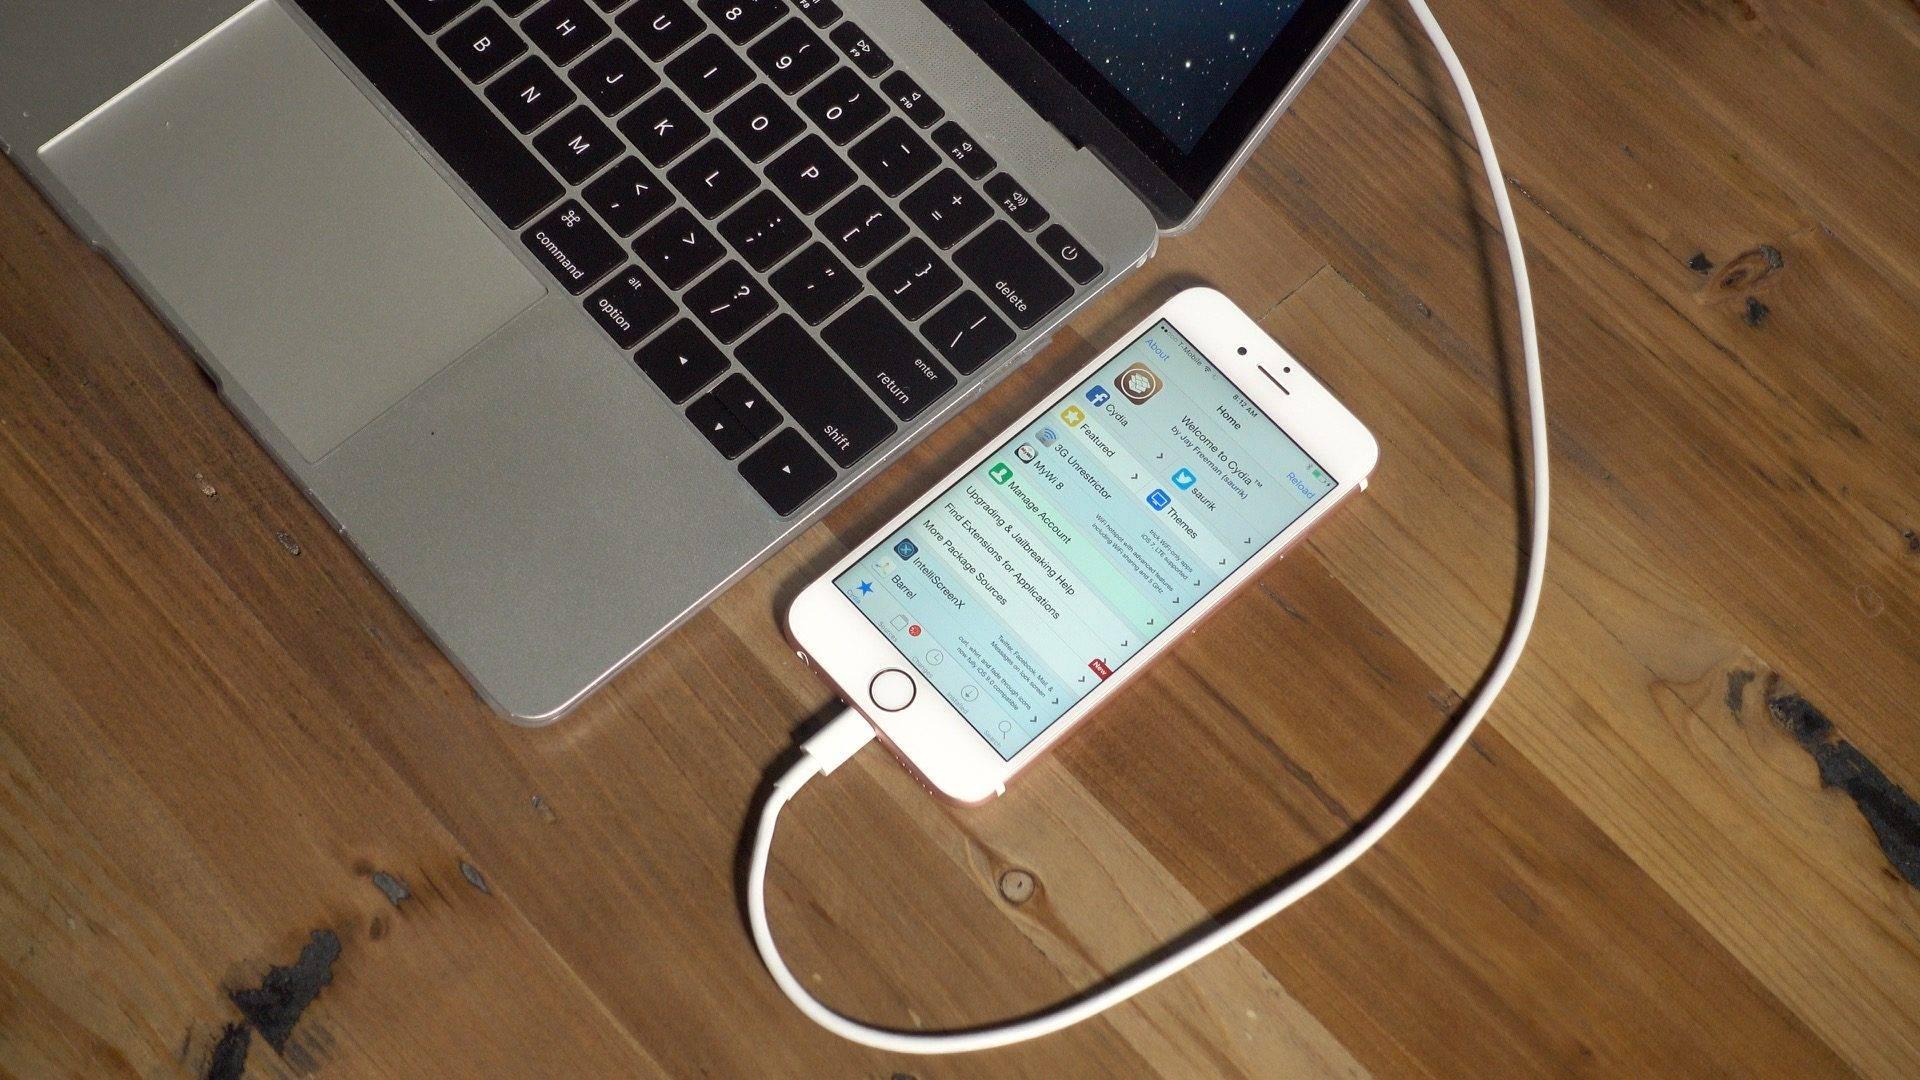 Iphone Tethered Jailbreak